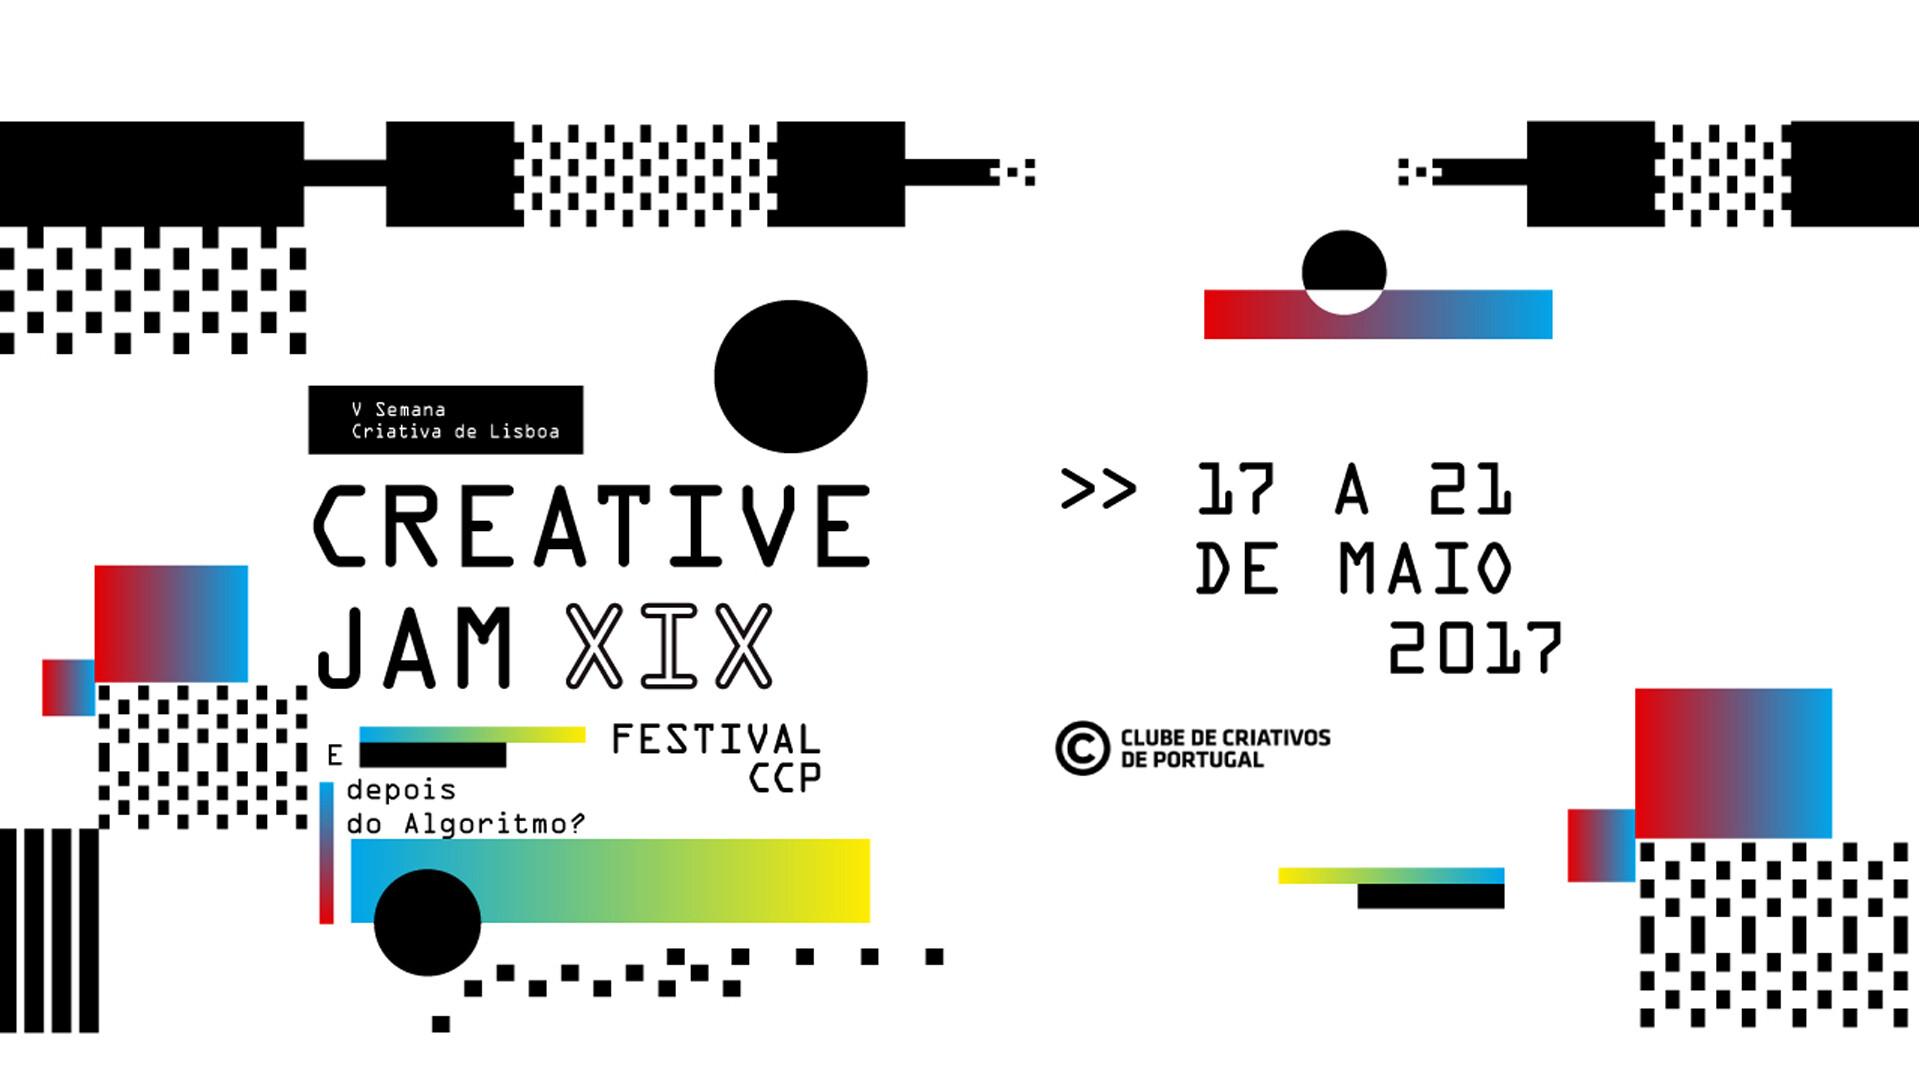 festival-ccp